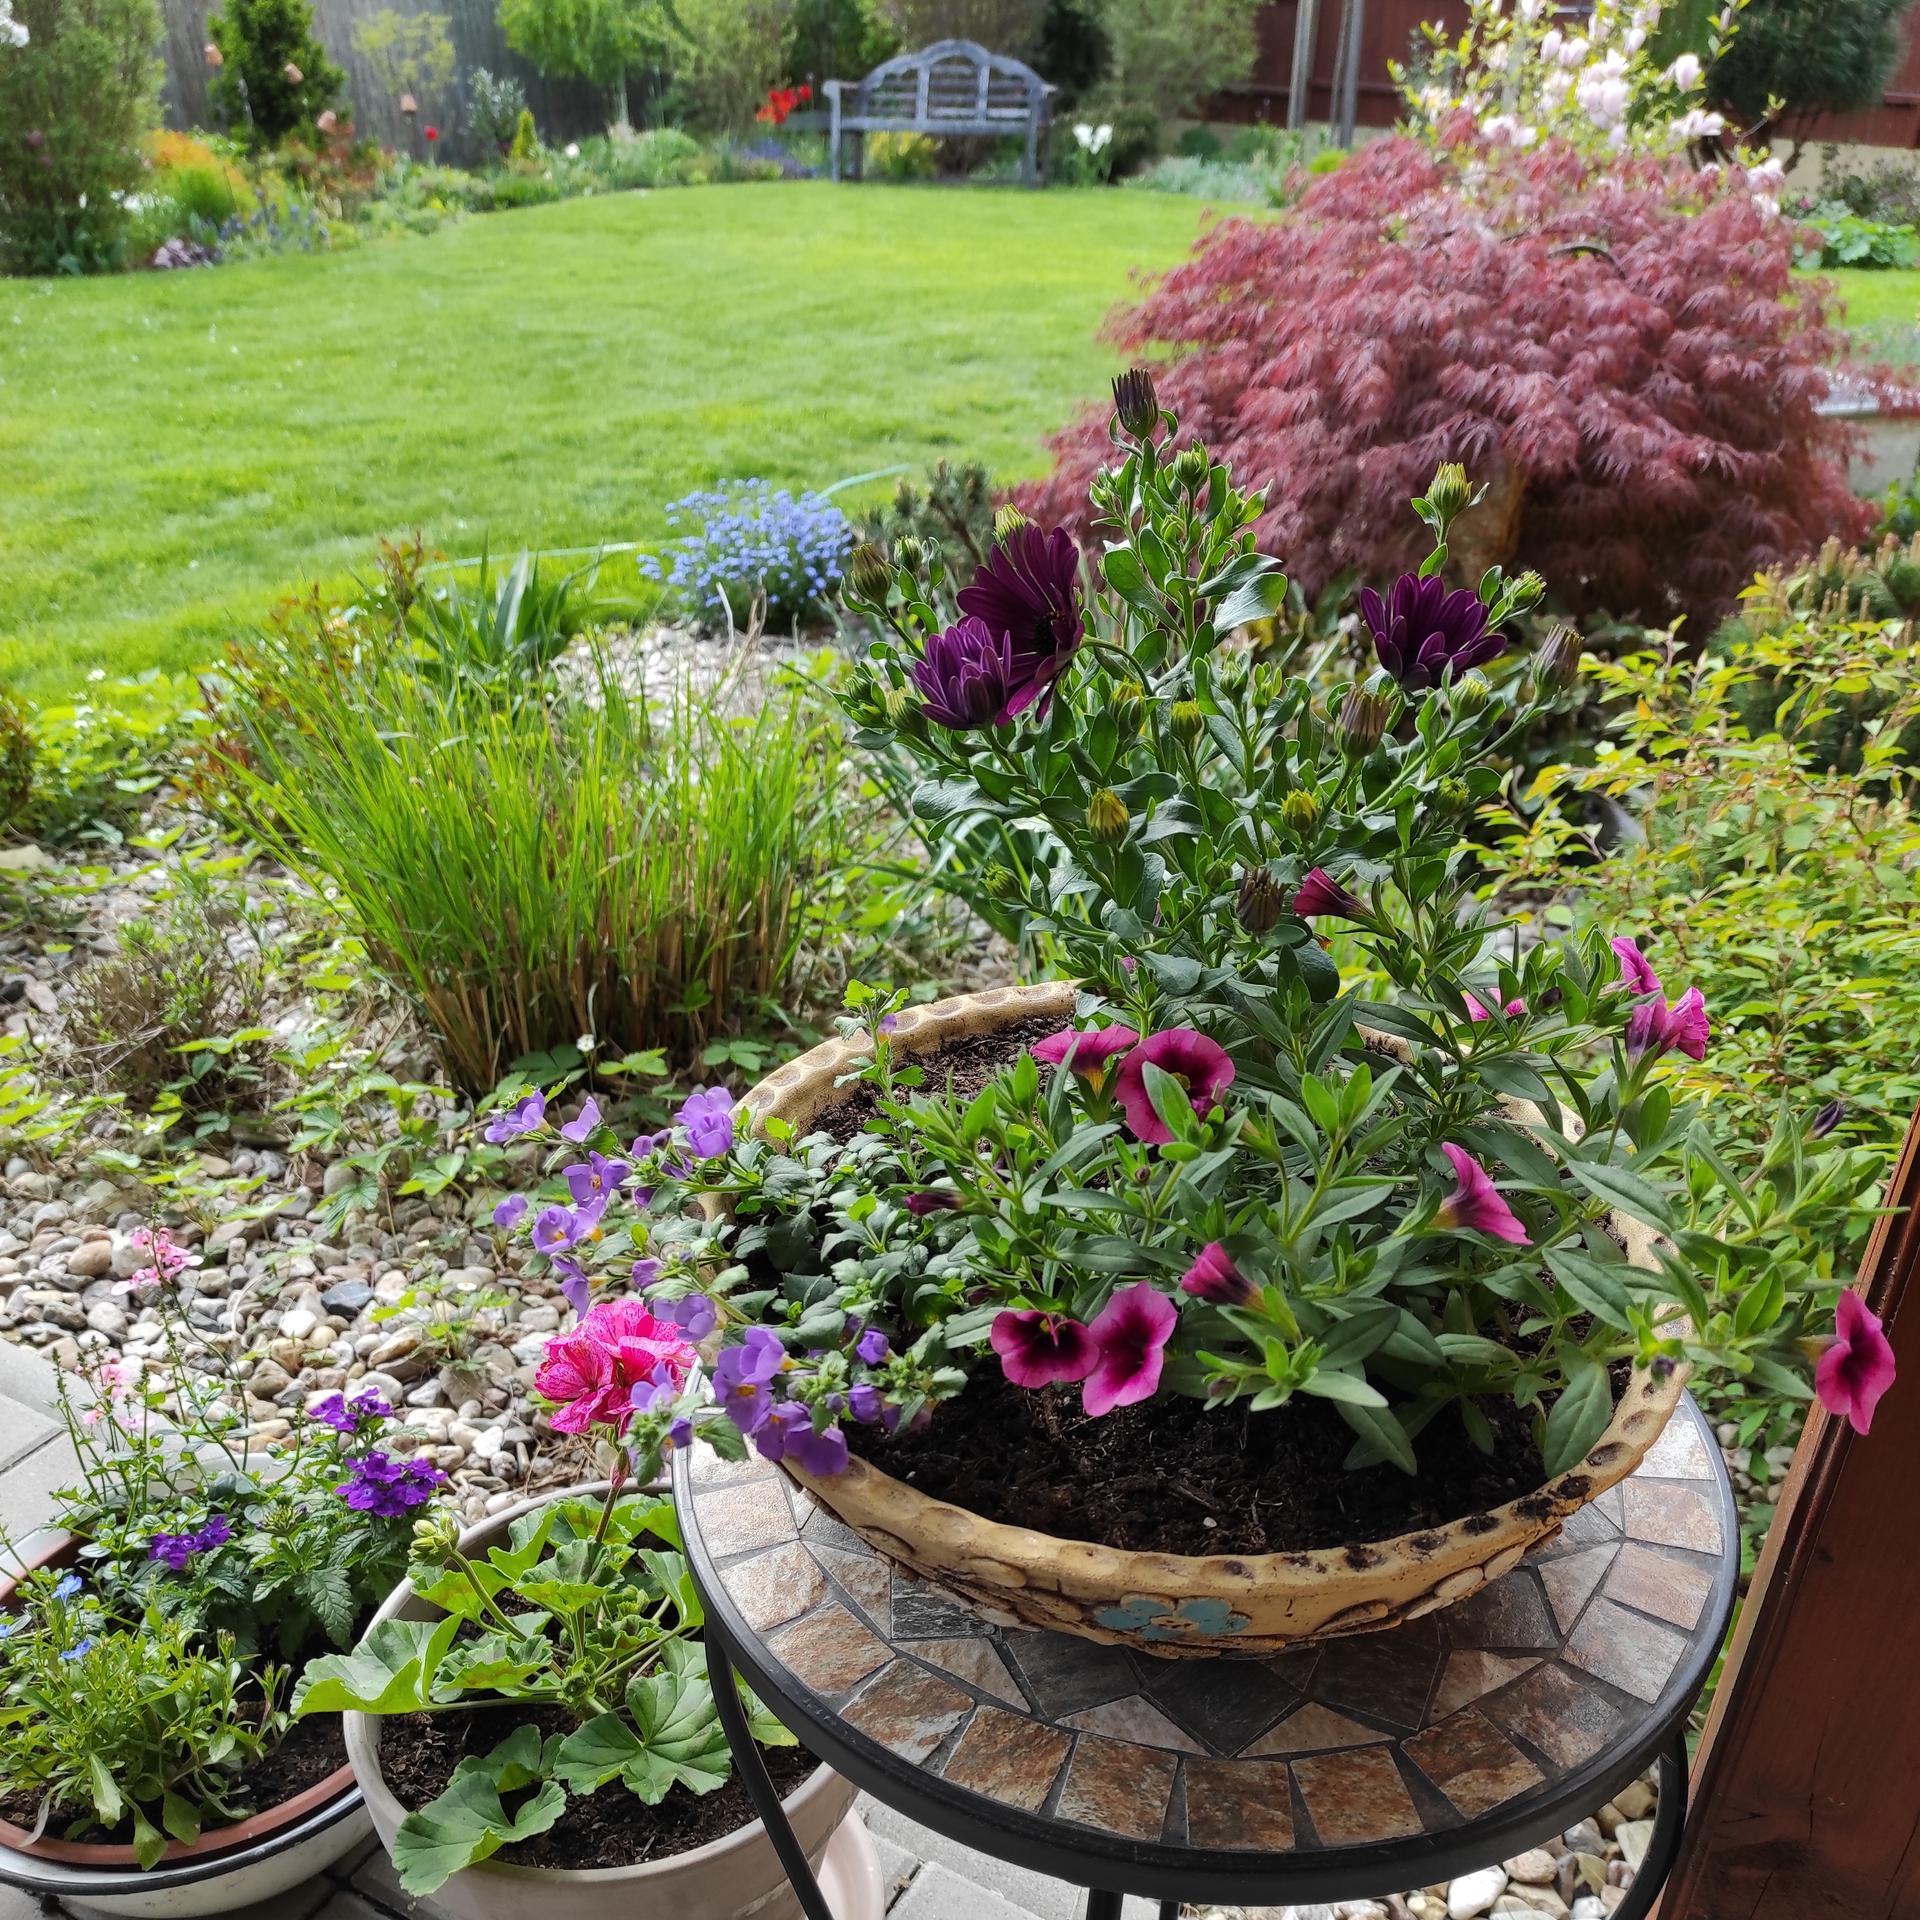 Zahrada 2021 - Obrázek č. 20